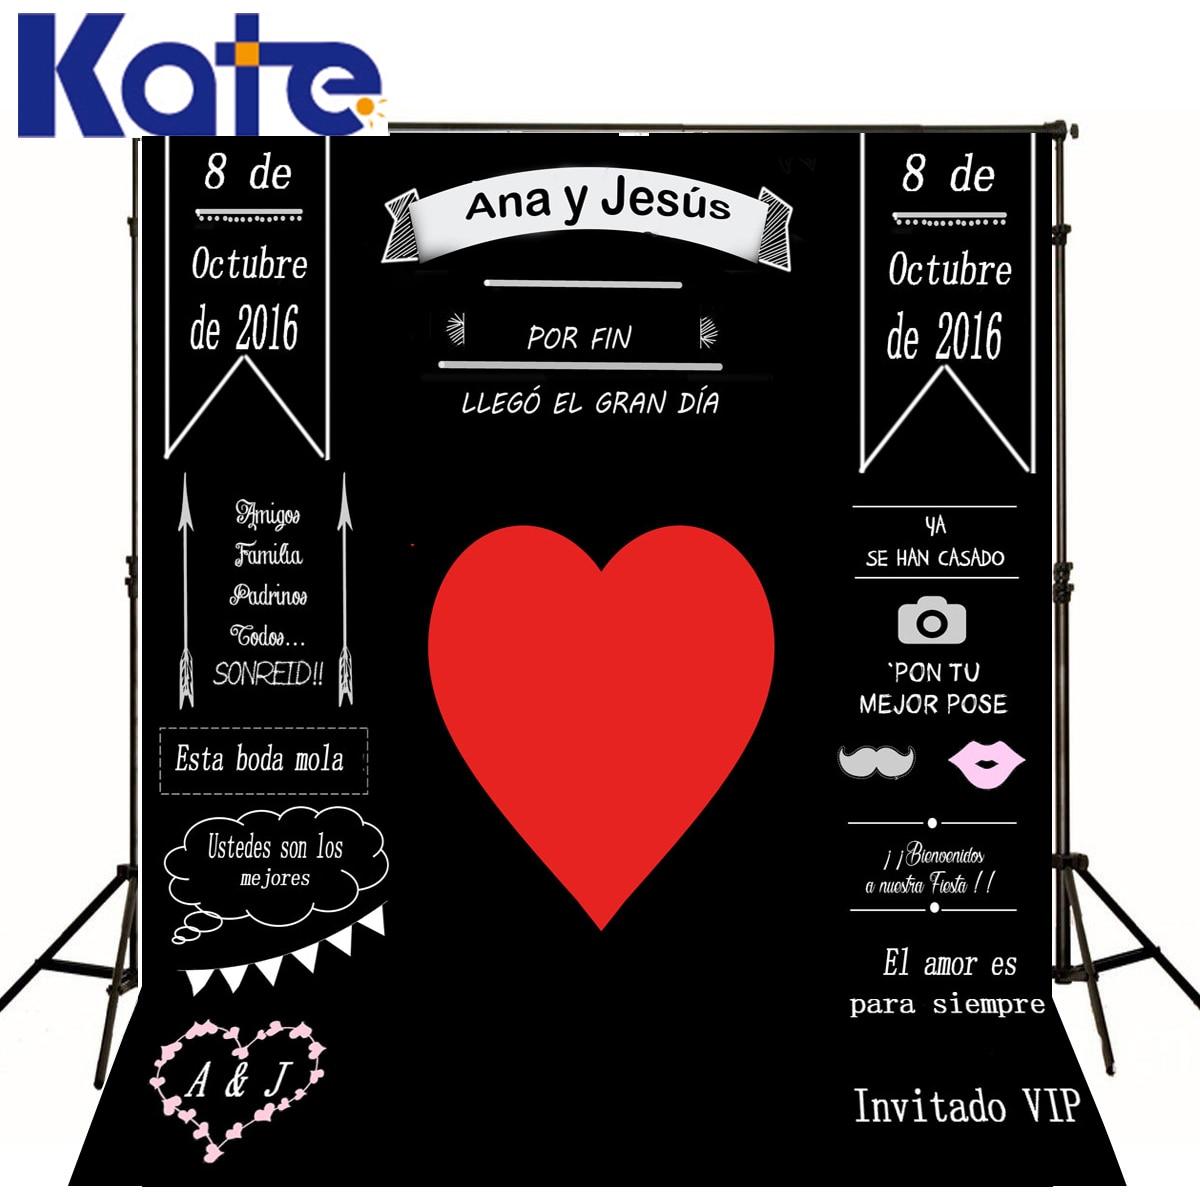 Kate Custom Wedding Blackboard Background Red Heart Can Add Name Symbol Date Change Customise size made fotostudio photocall сумка kate spade new york wkru2816 kate spade hanna